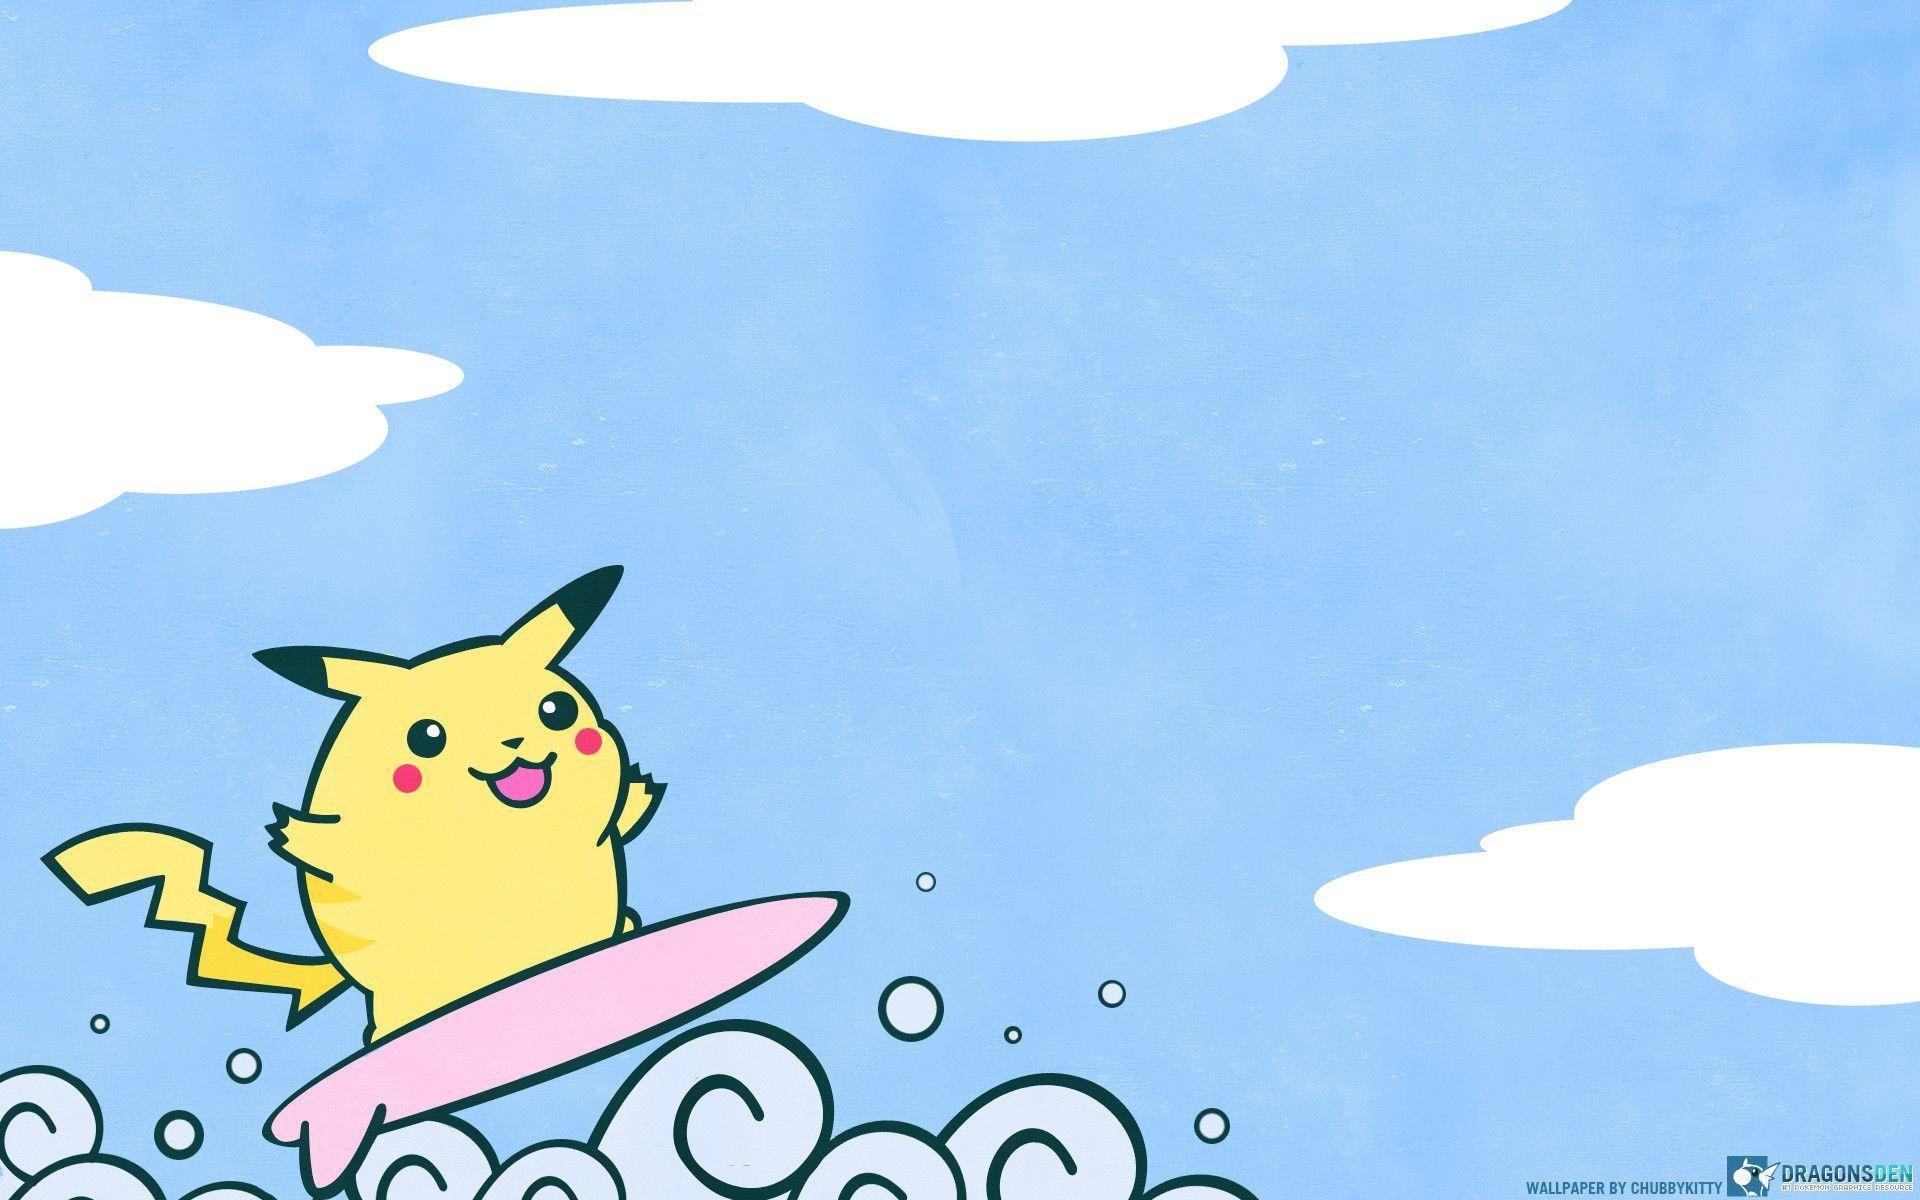 Res: 1920x1200, Pokemon Wallpaper Cute Pikhacu Image | Wallpaper | Basic Background